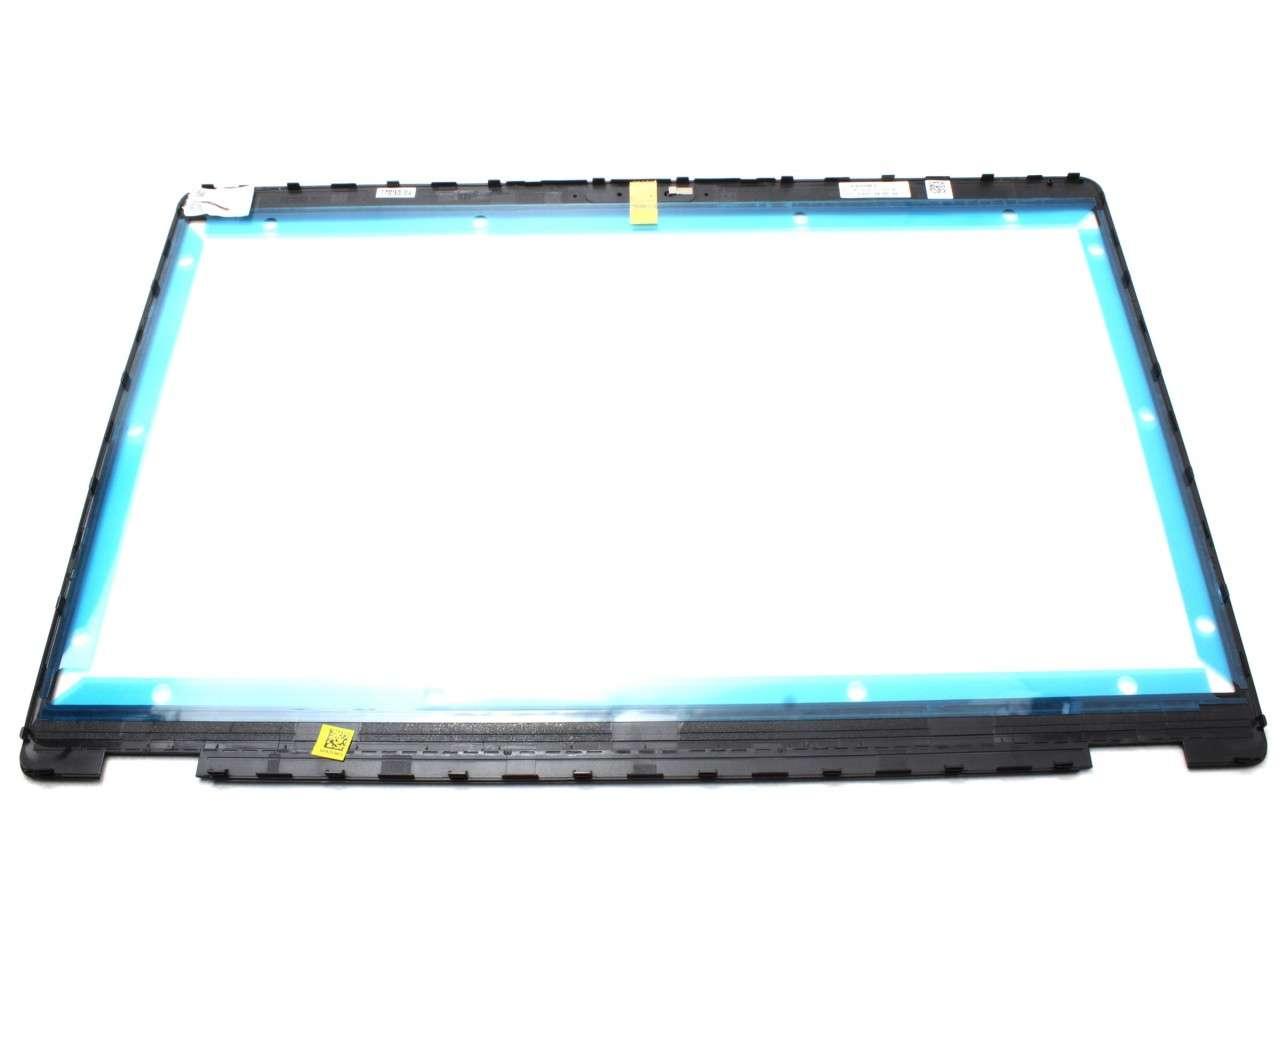 Rama Display Dell Latitude E3541 Bezel Front Cover Neagra imagine powerlaptop.ro 2021